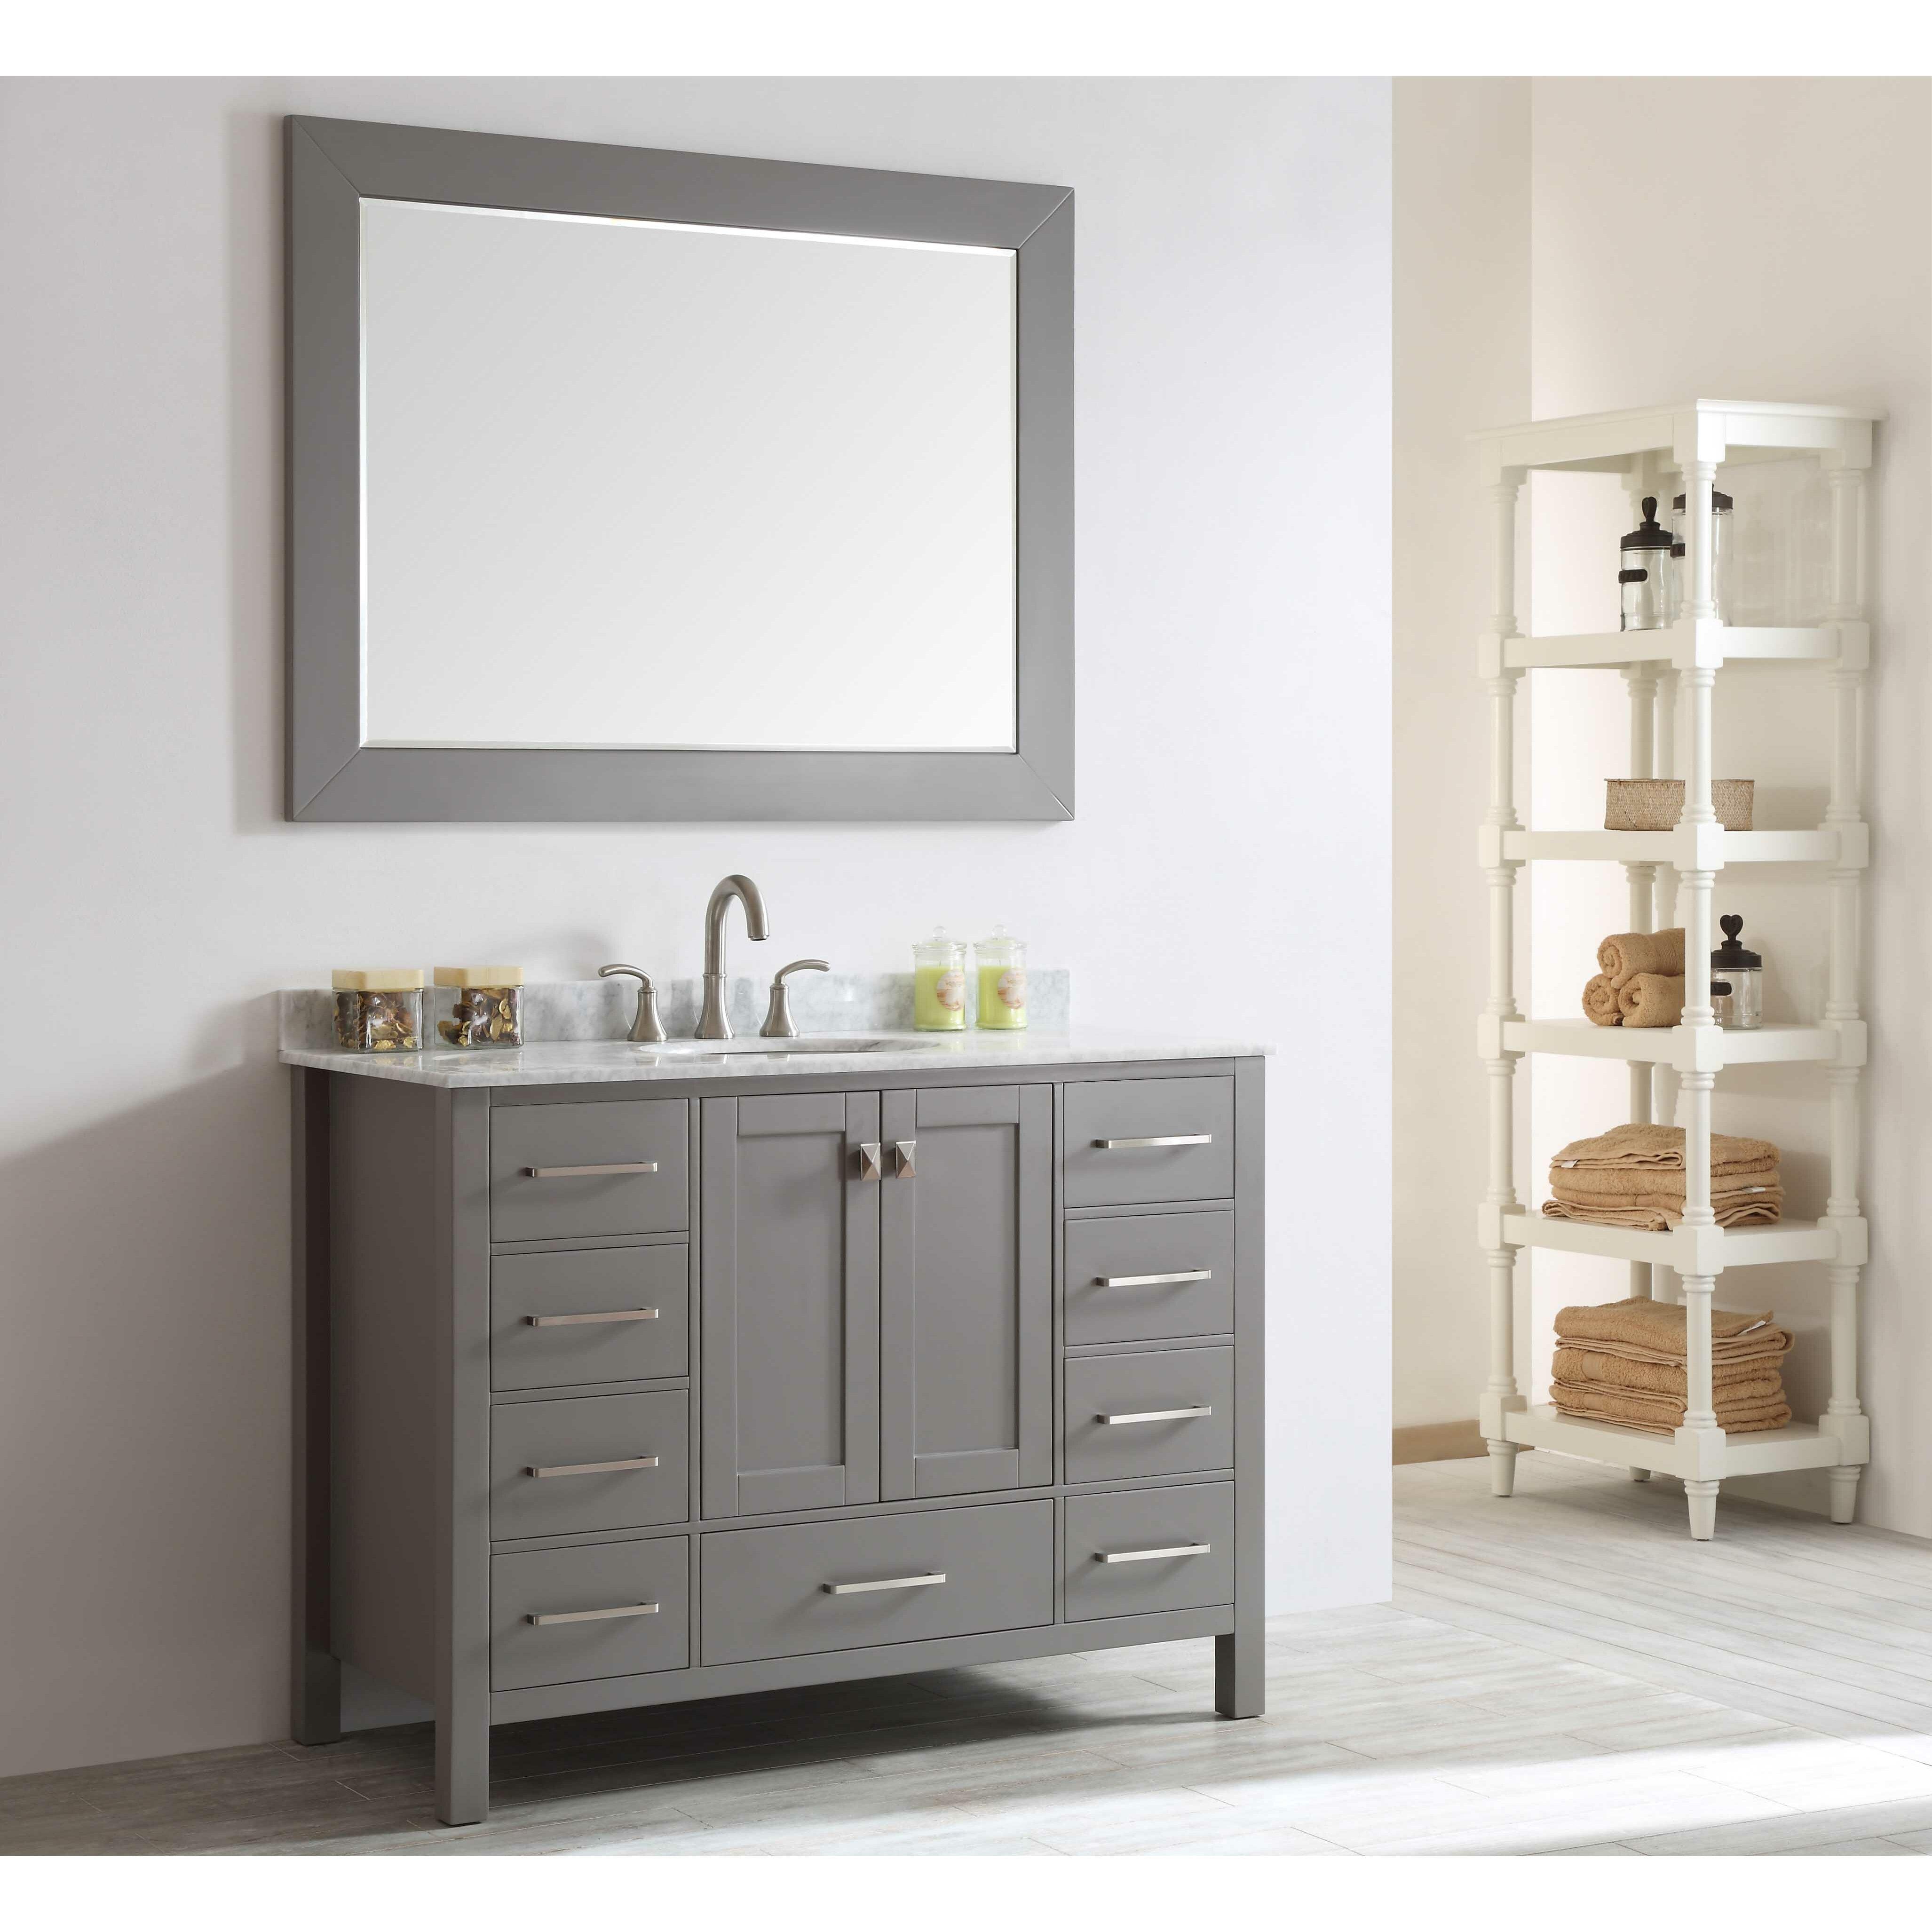 Just Cabinets Aberdeen Eviva Aberdeen 48 Single Bathroom Vanity Set Reviews Wayfair